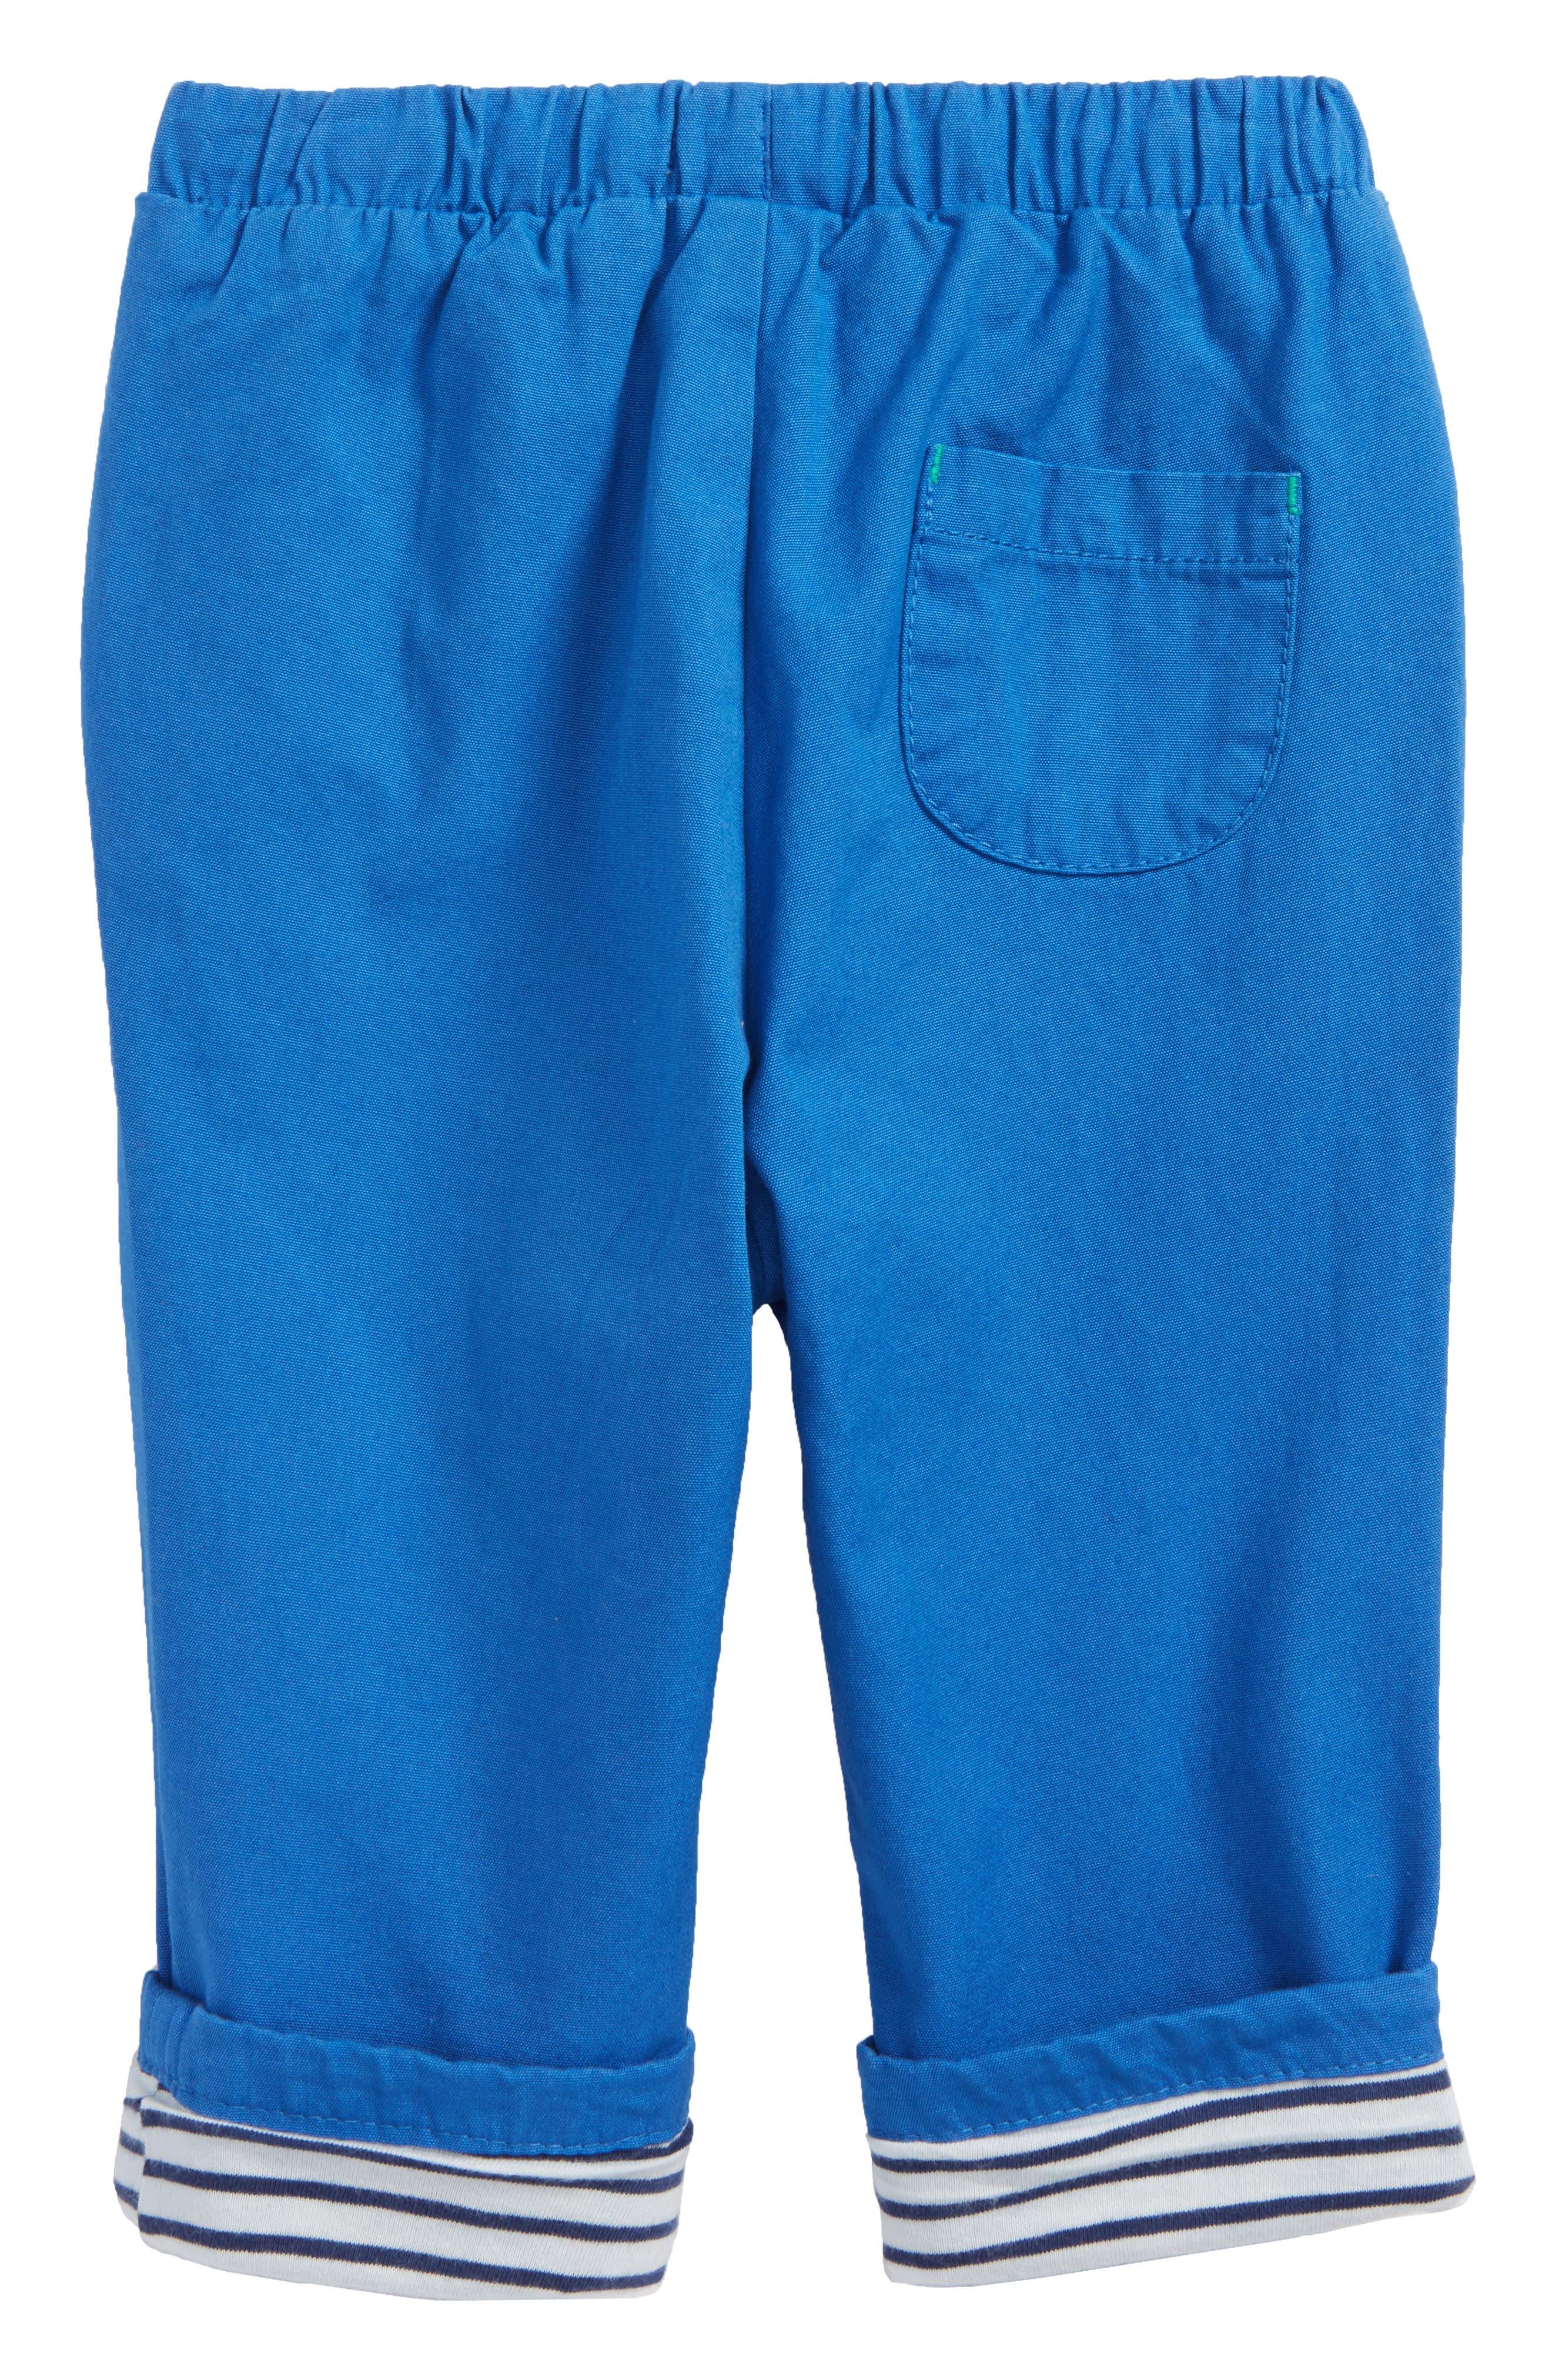 Pull On Pants,                             Alternate thumbnail 2, color,                             Skipper Blue